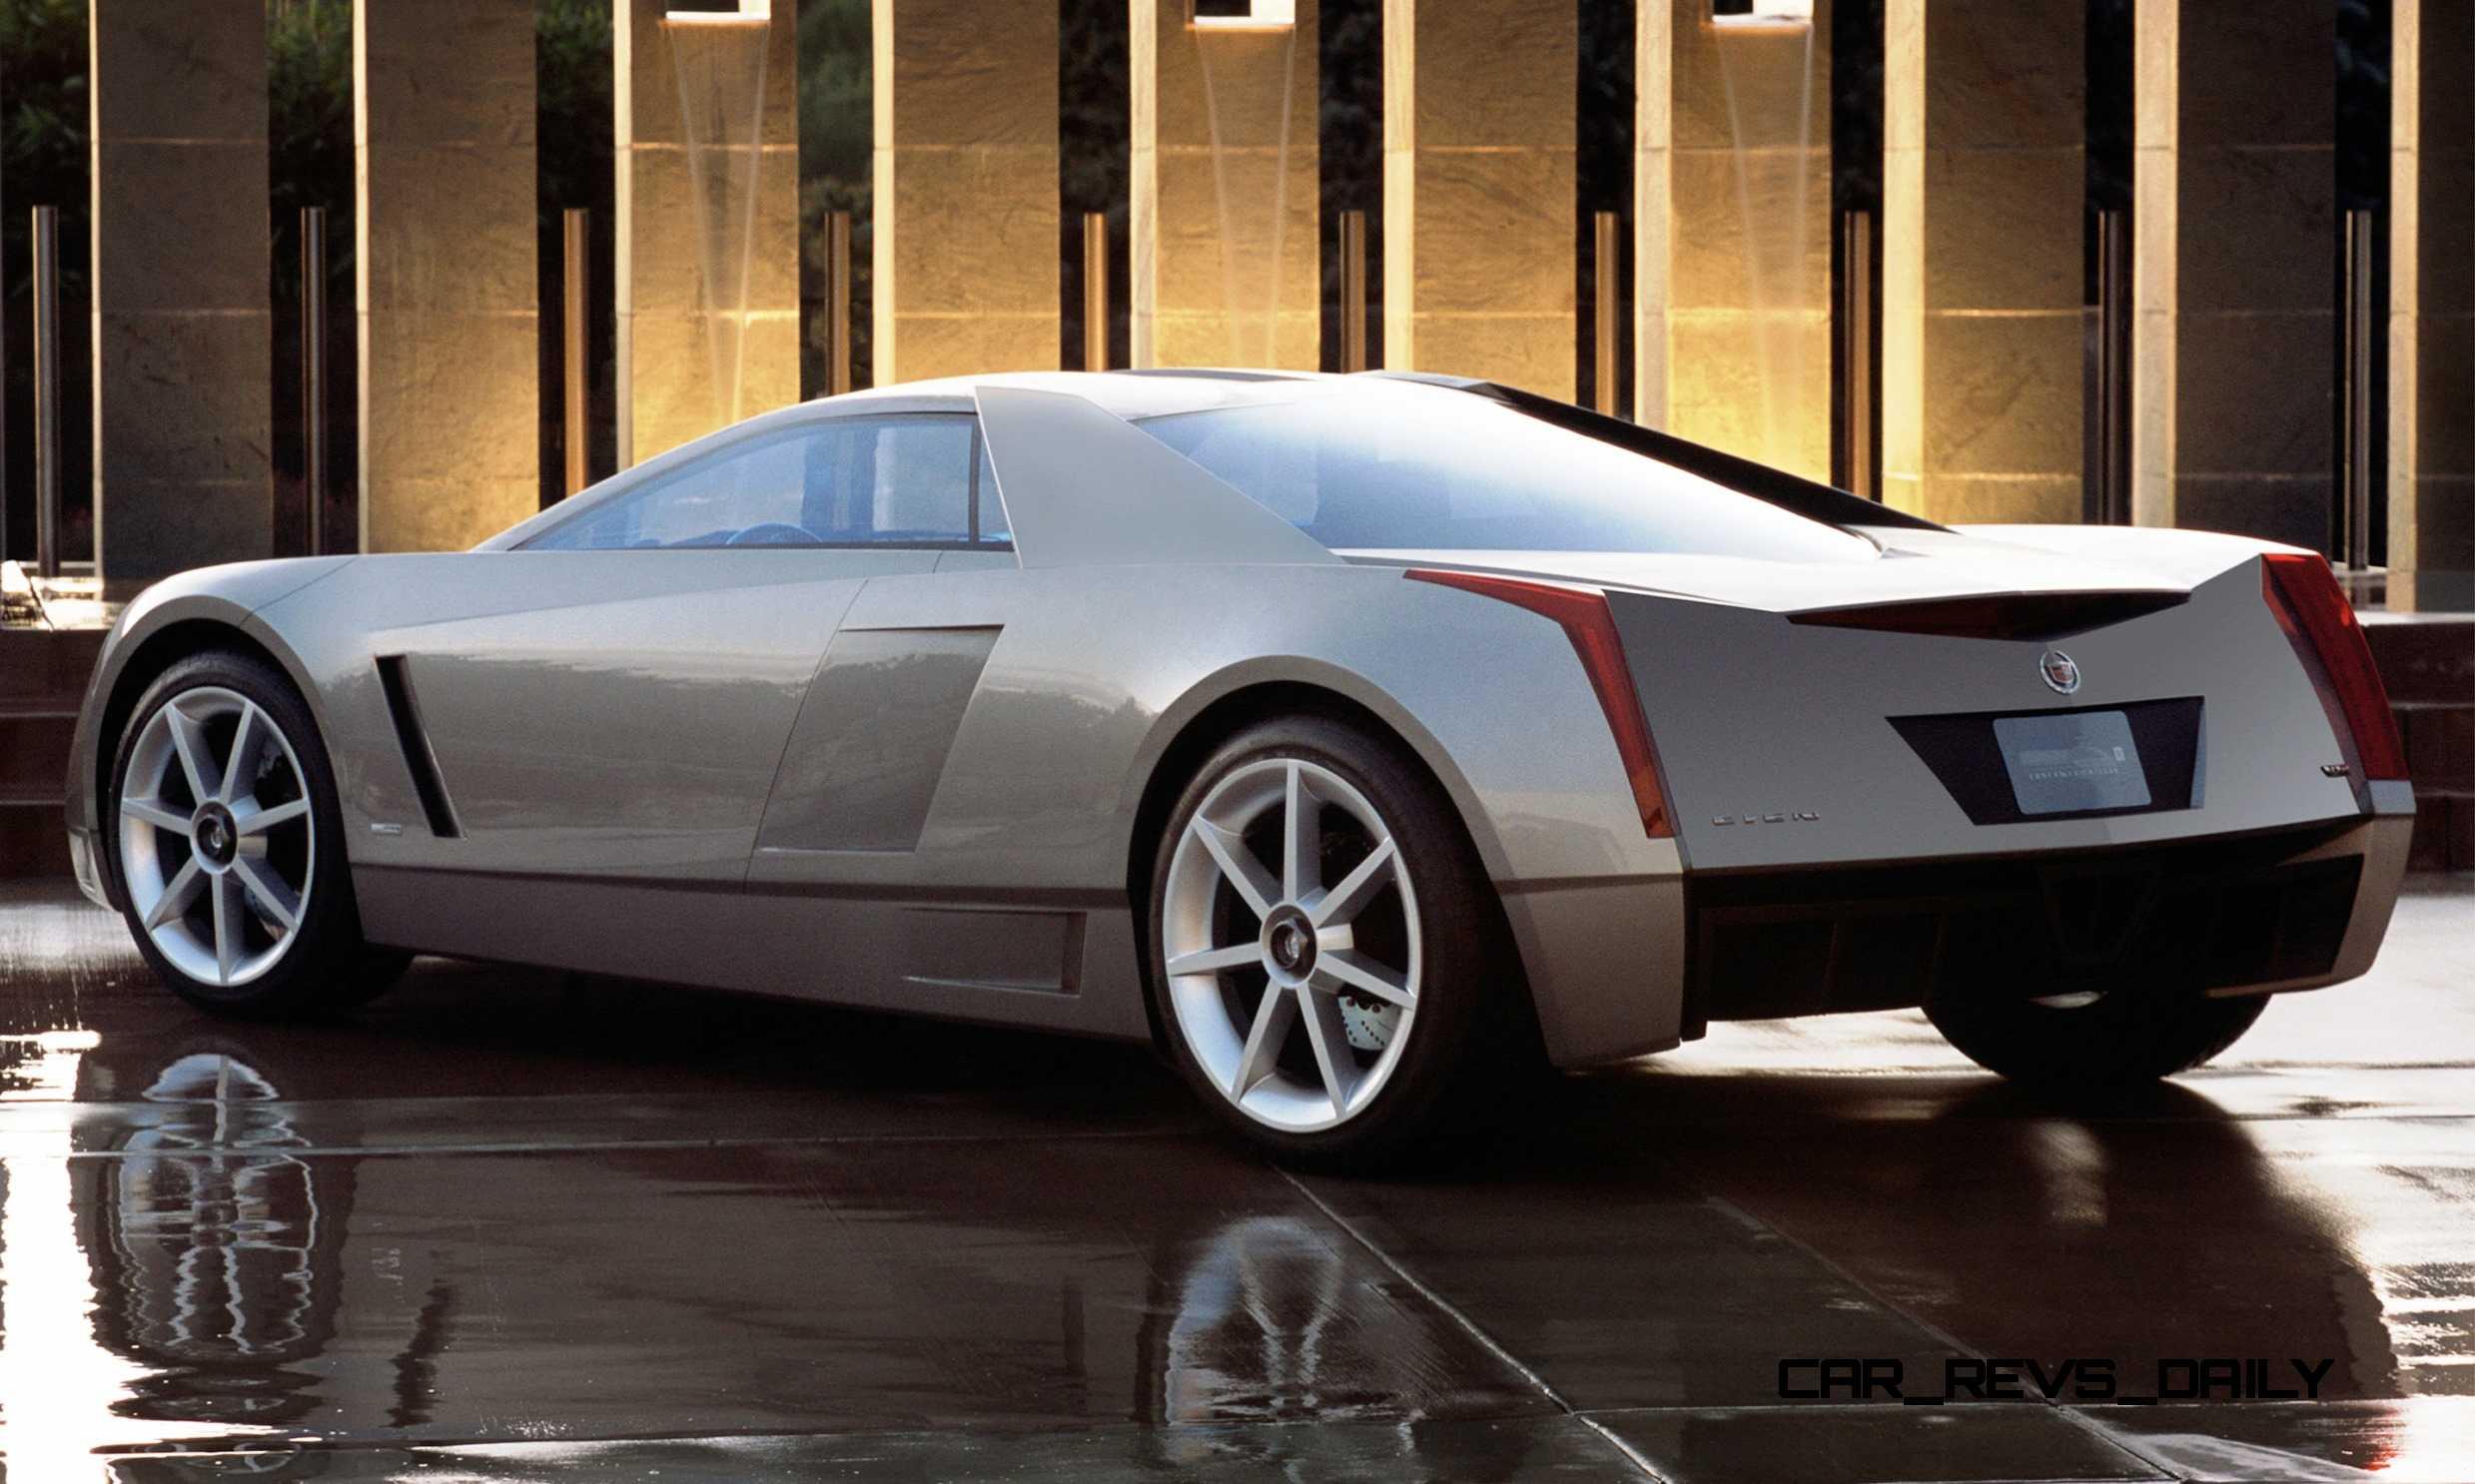 Qotd Cadillac Head Our Upcoming Halo Car Will Stun The World